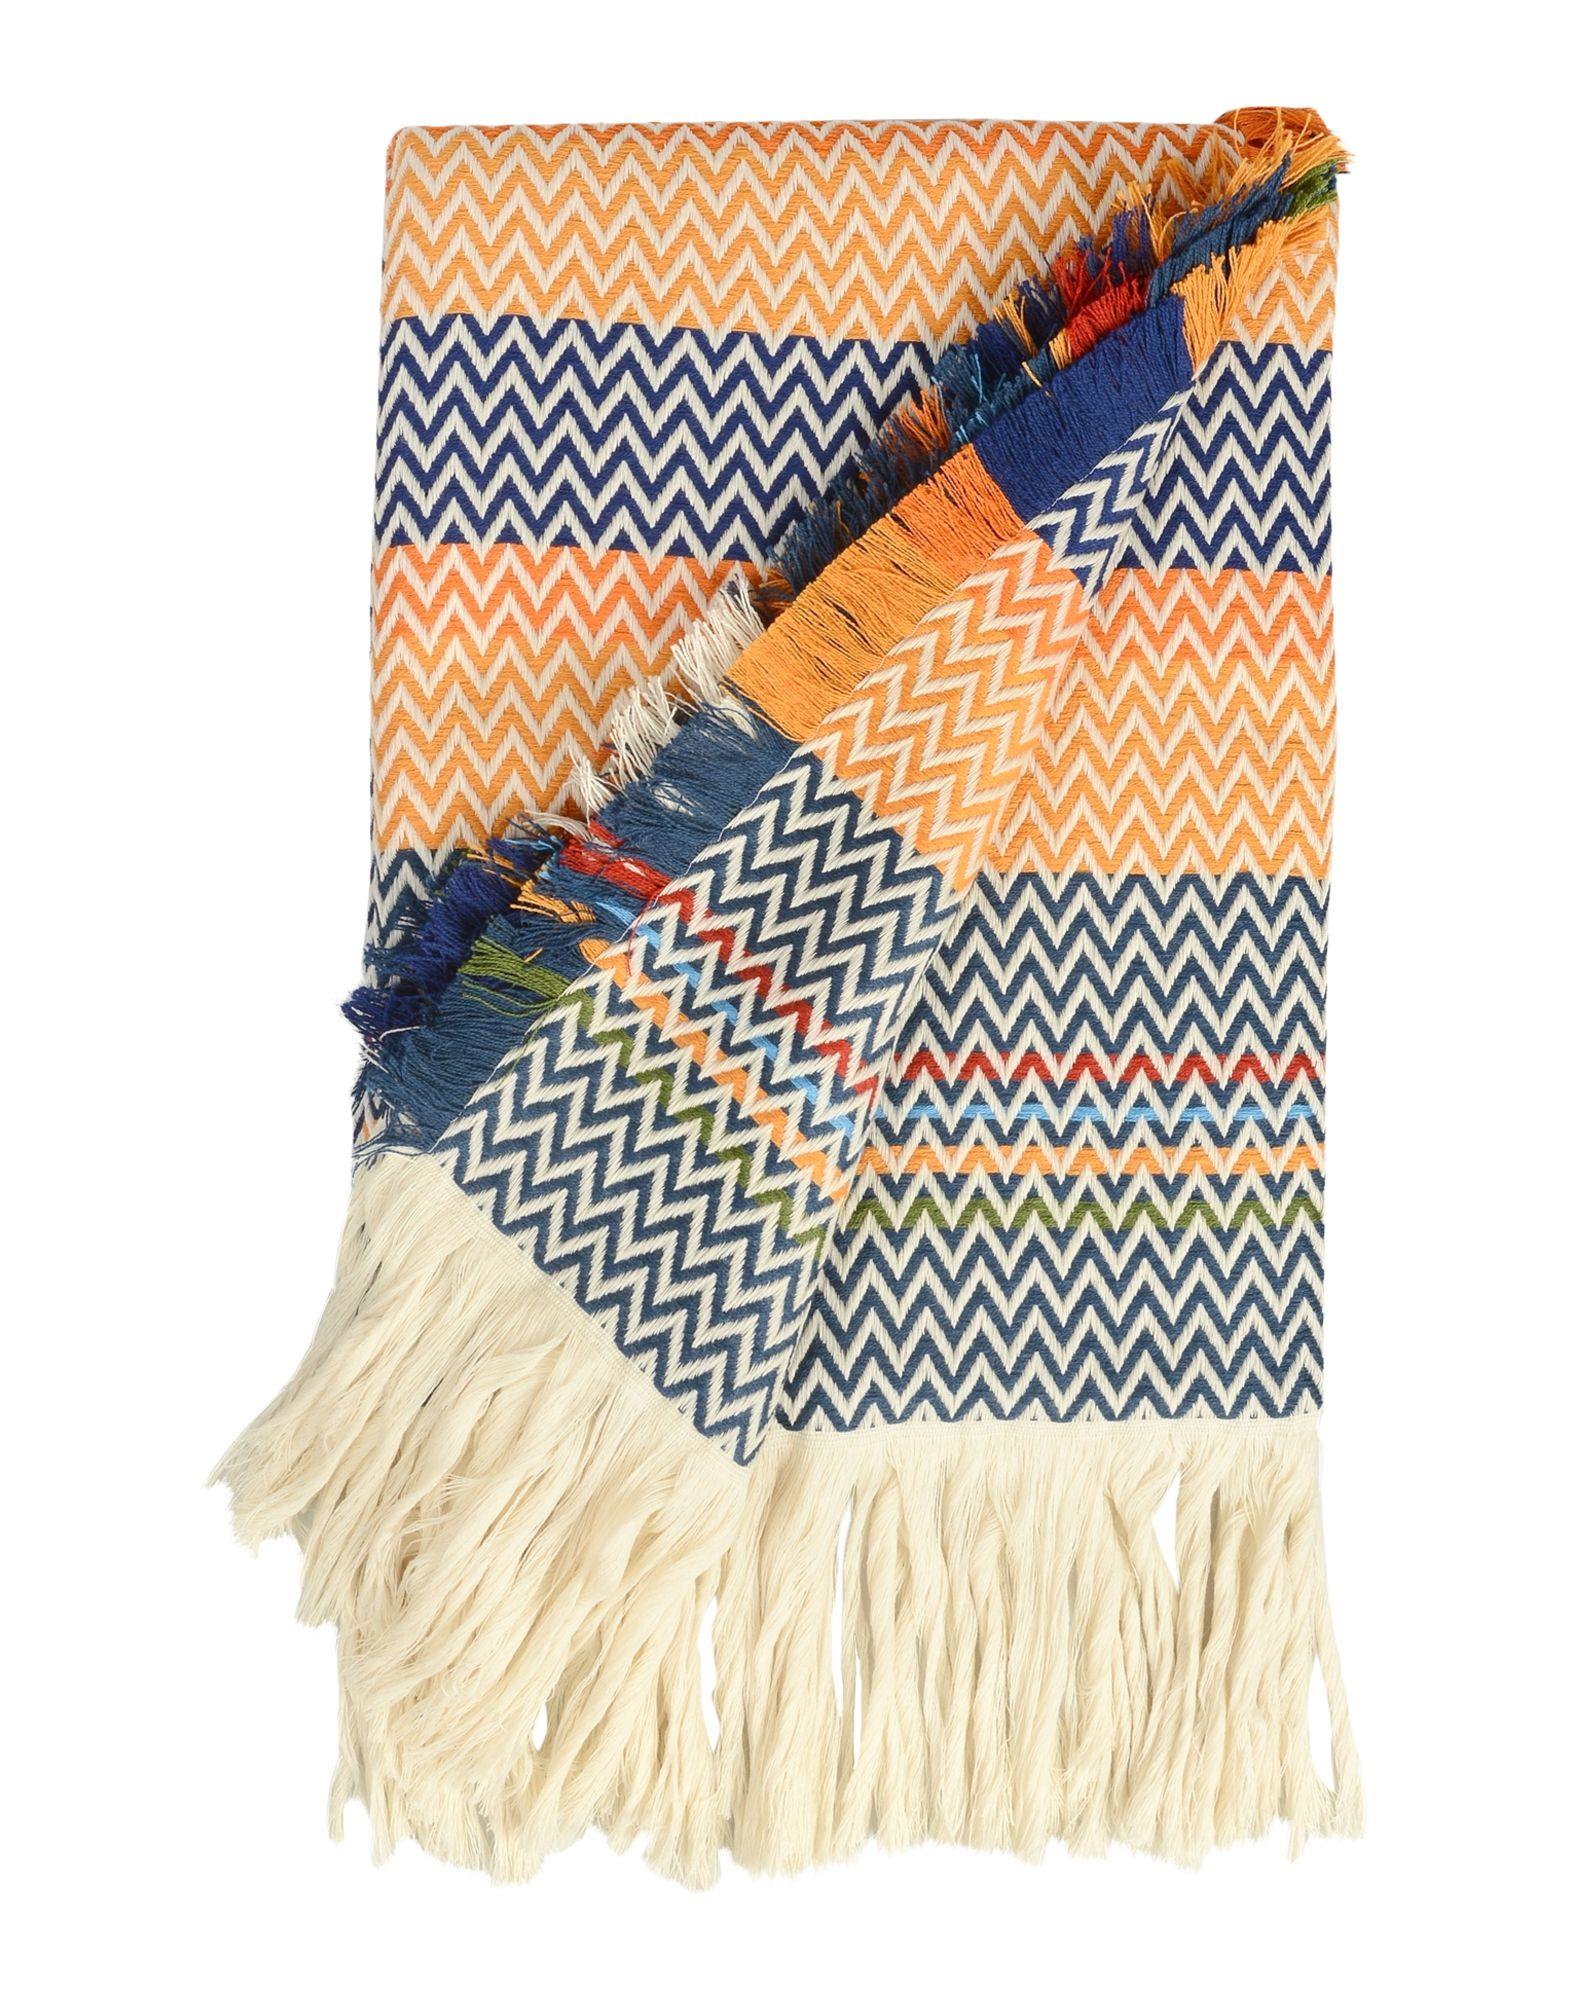 Mandal Veveri Blankets